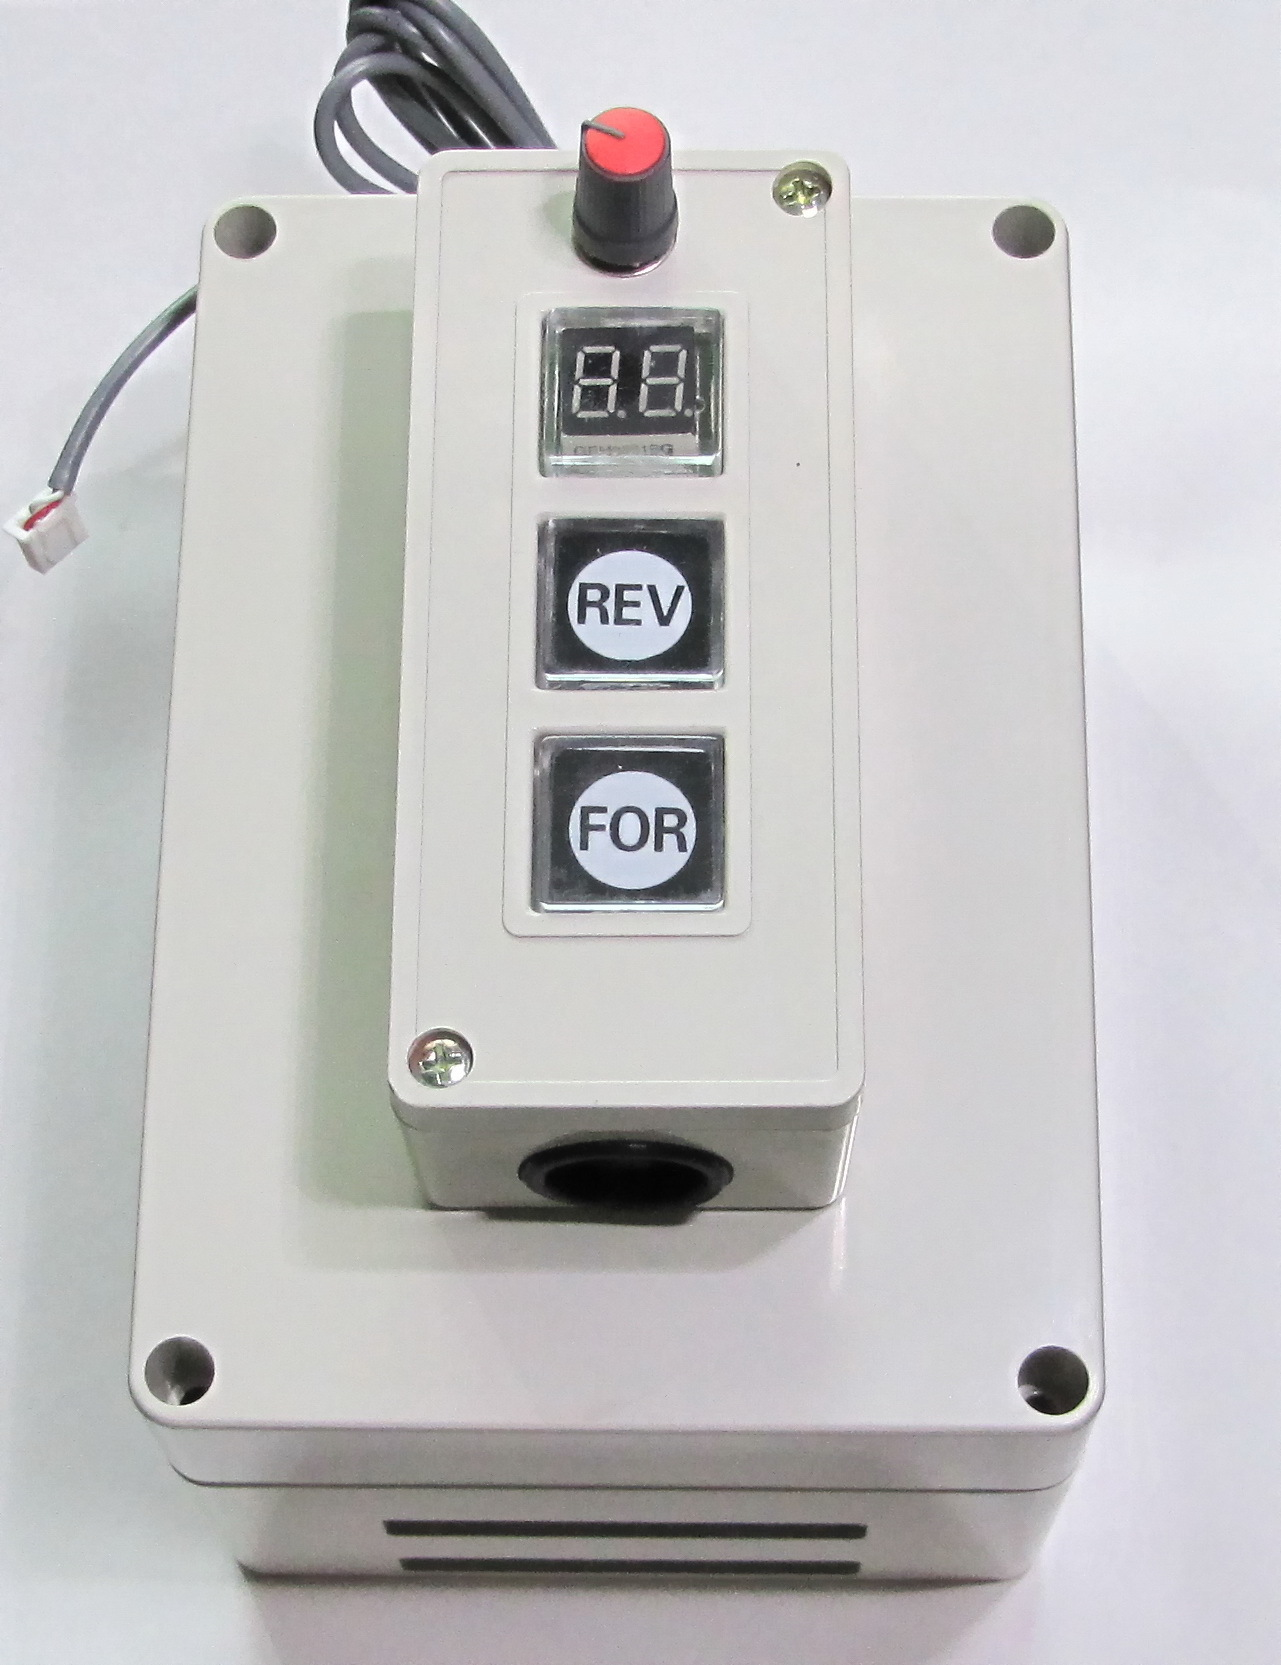 Инвертор 1500W инвертора 1.5kW инвертор, токарный станок сверлильный инвертор, инвертор, шпинделя привода